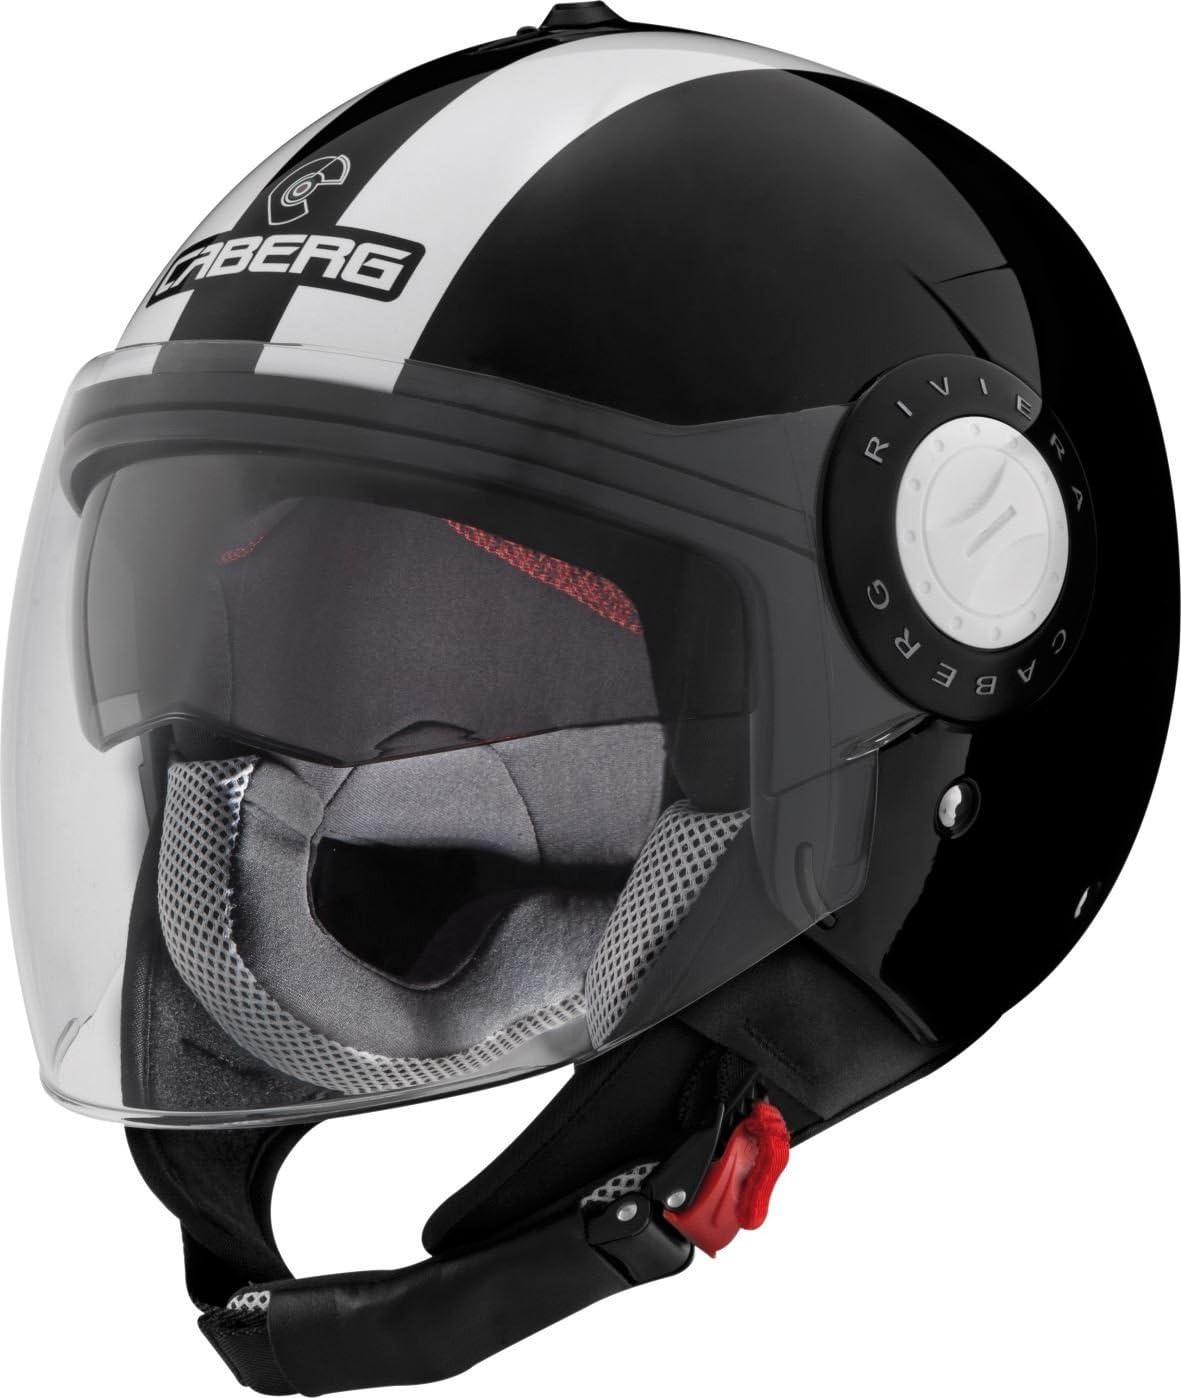 Neue Caberg Riviera V2 Legende Dvs Open Face Motorradhelm L 59-60cm